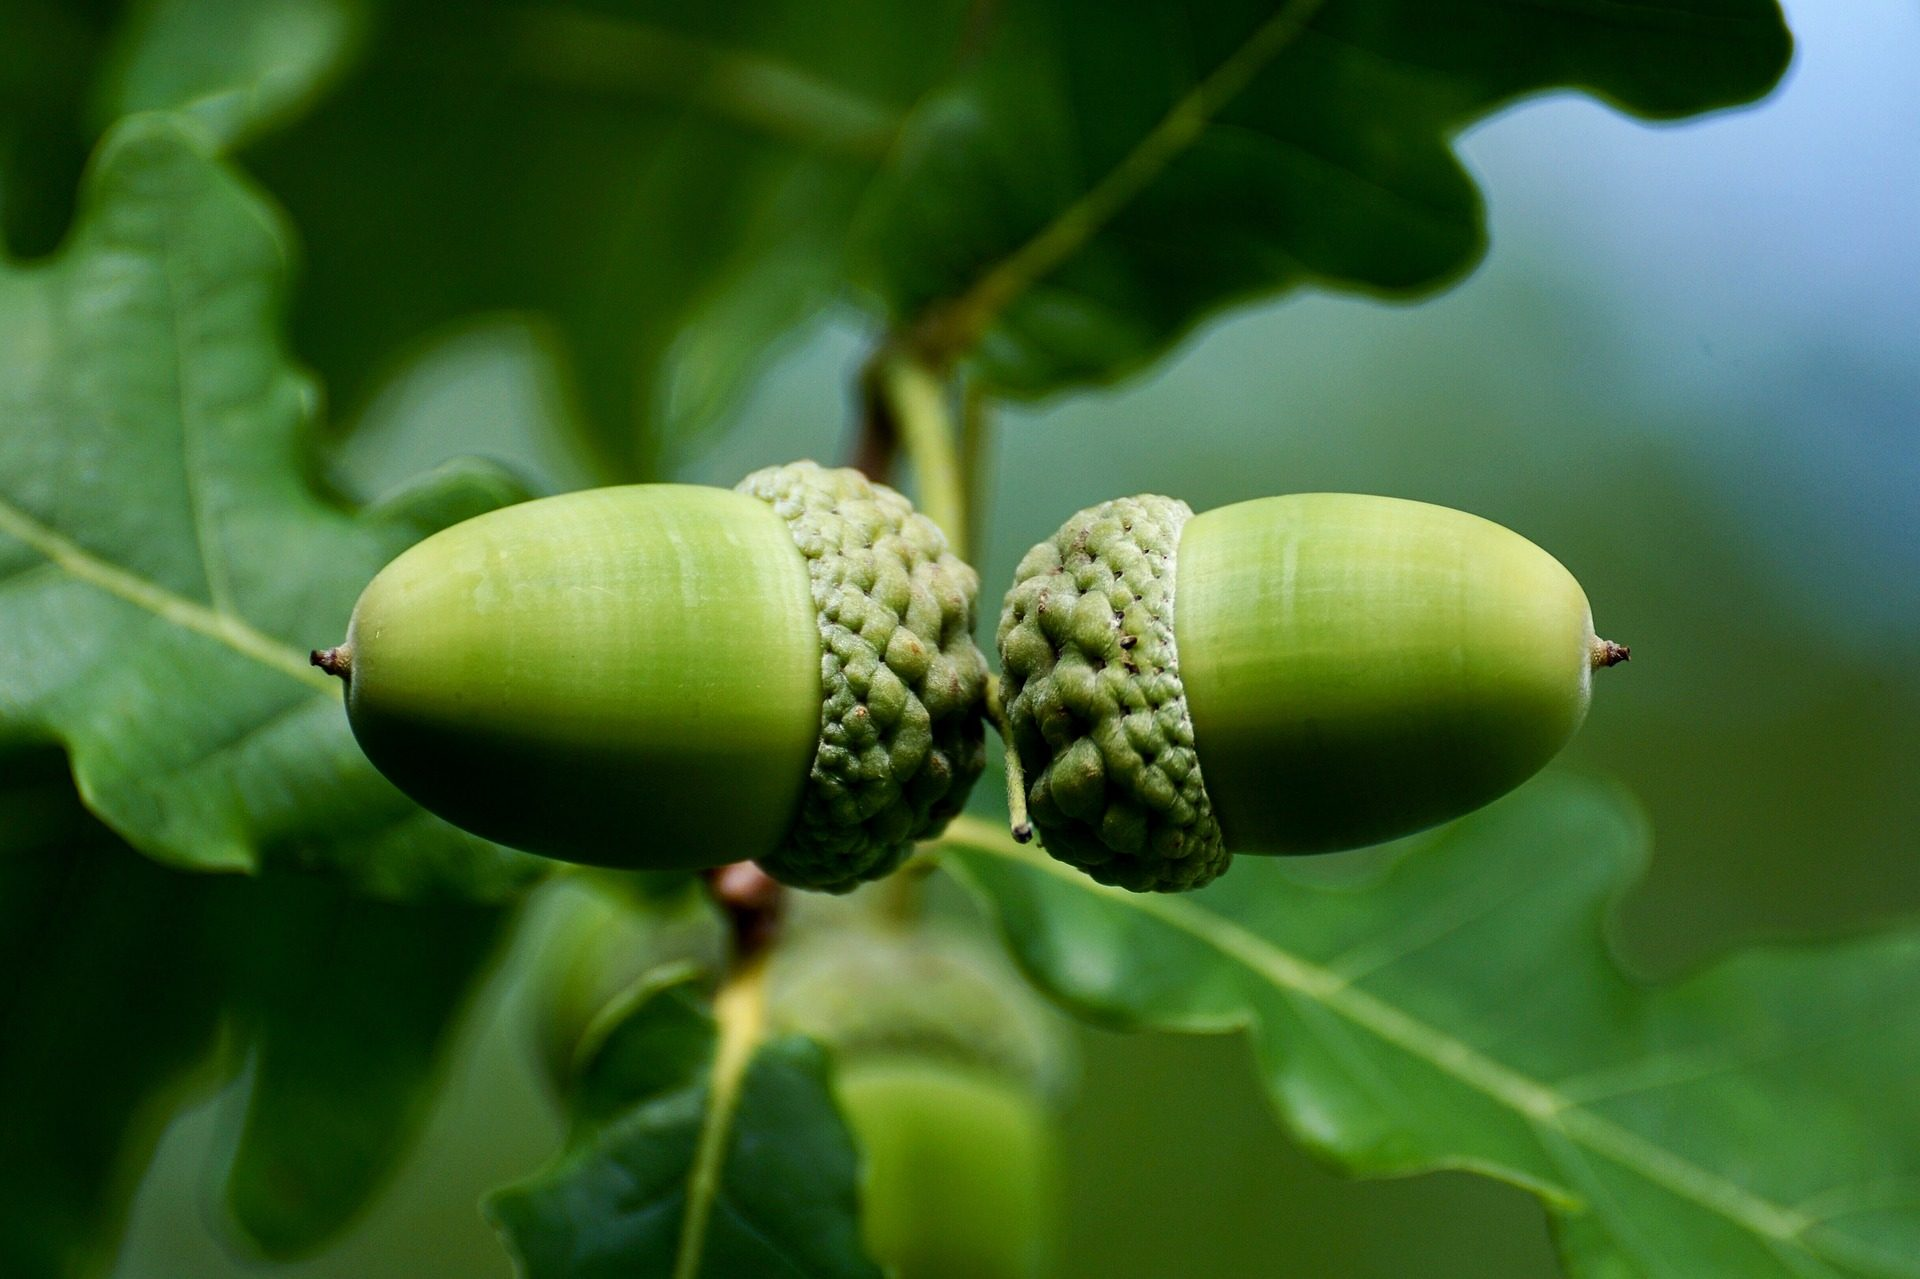 Acorns, फल, गोले, पेड़, शाखा, Encina - HD वॉलपेपर - प्रोफेसर-falken.com